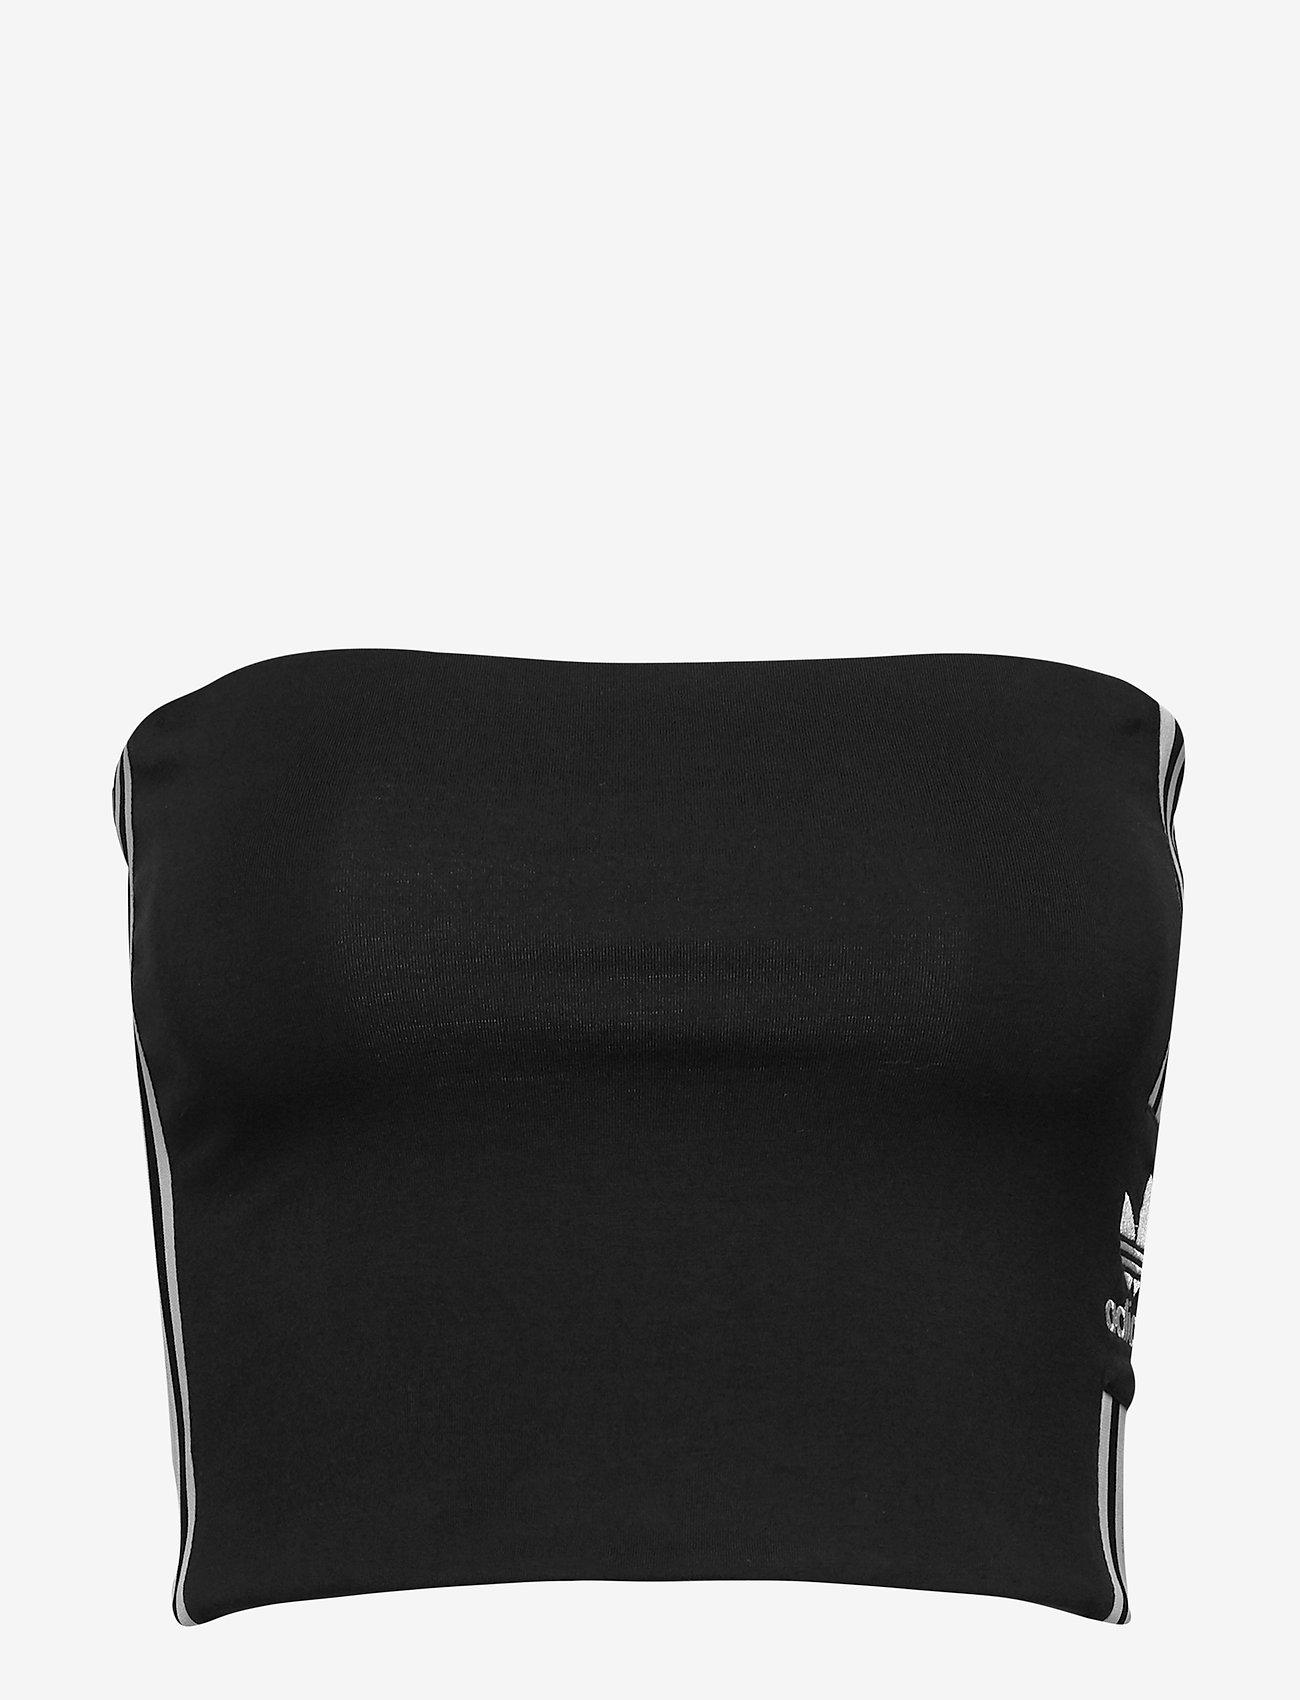 adidas Originals - TUBE TOP - crop-tops - black/white - 1